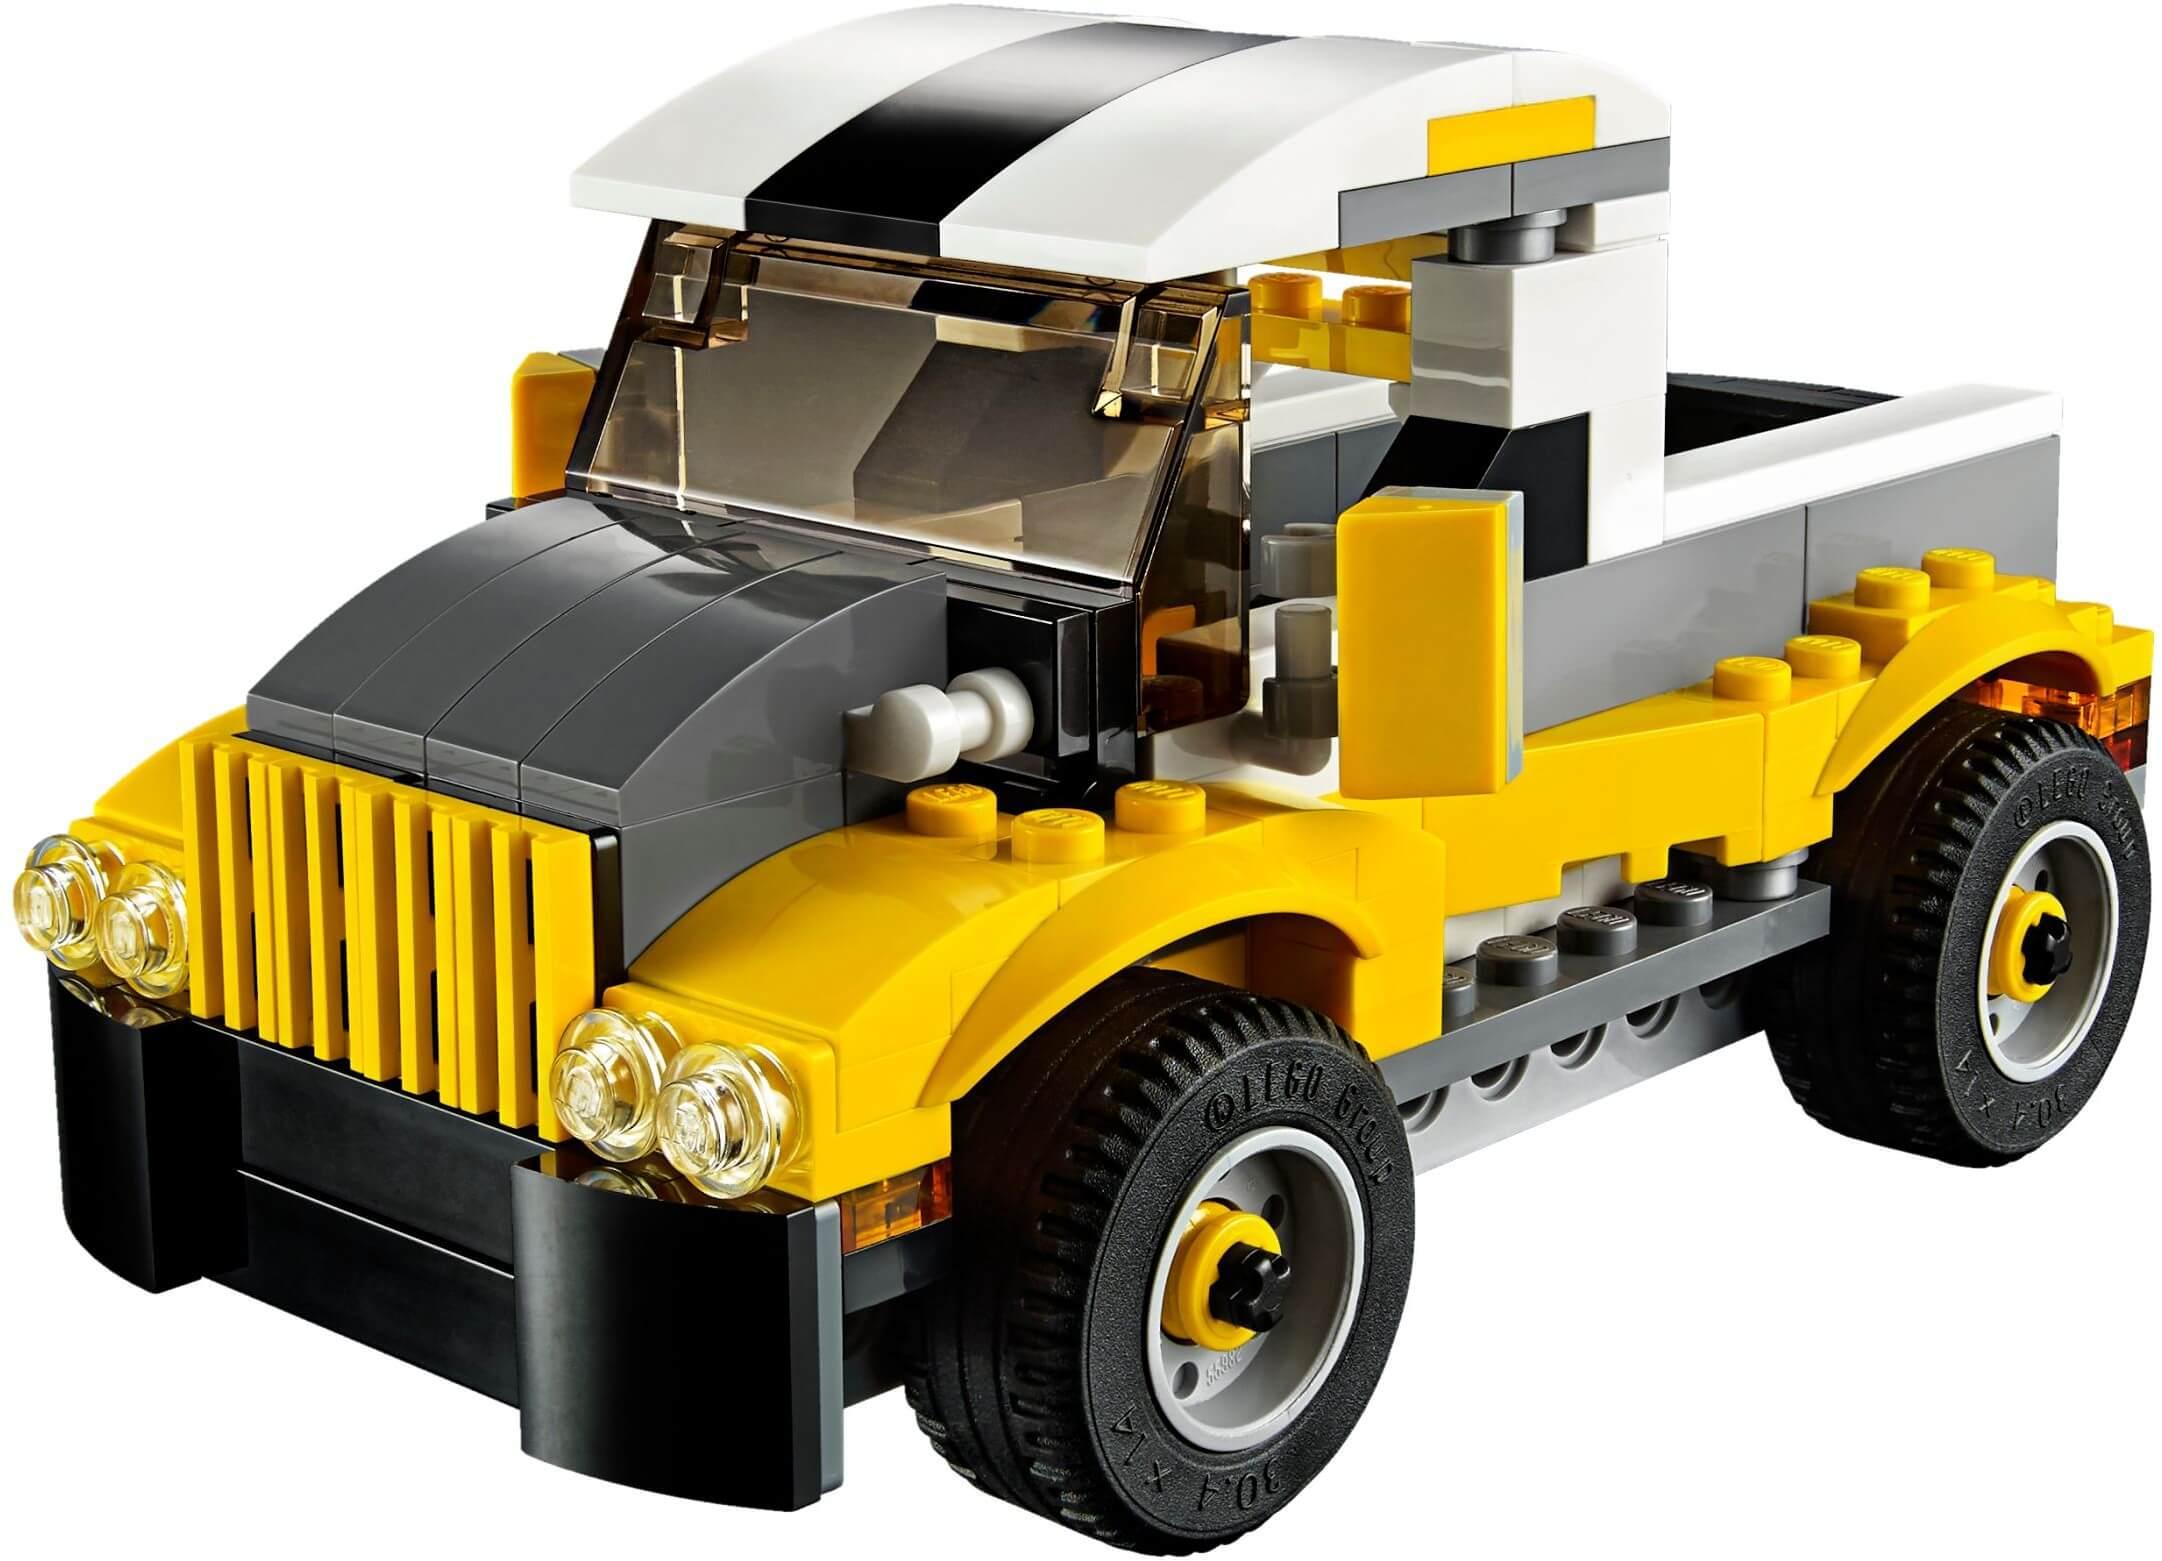 Mua đồ chơi LEGO 31046 - LEGO Creator 31046 - Xếp hình Xe Đua - Xe Tải - Xe Ủi 3-trong-1 (LEGO Creator Fast Car 31046)